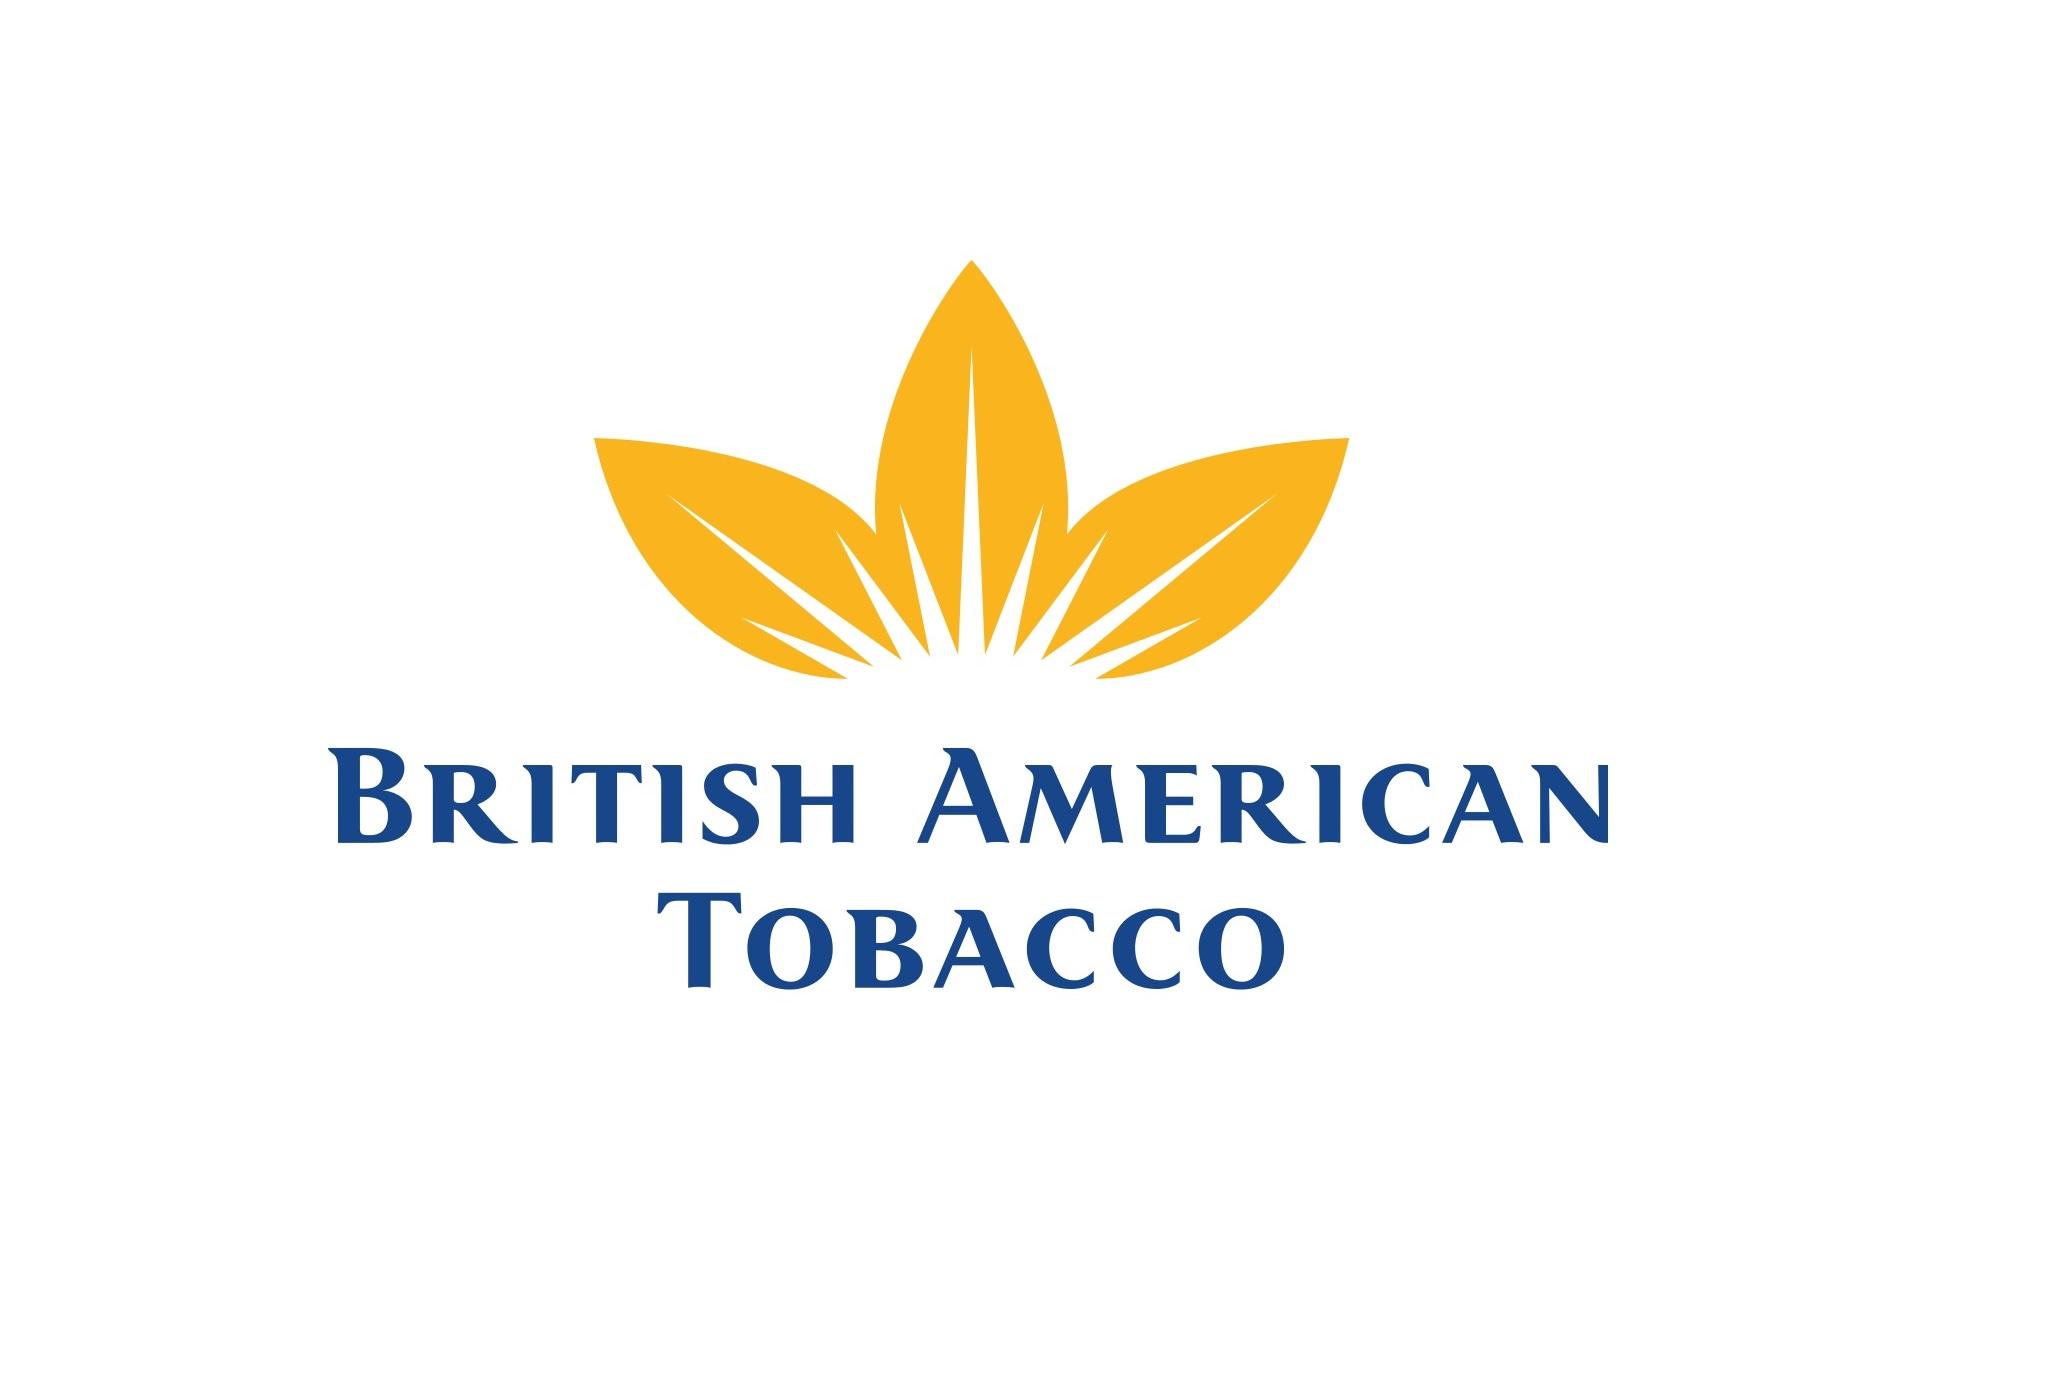 British American Tobacco logo (carousel)